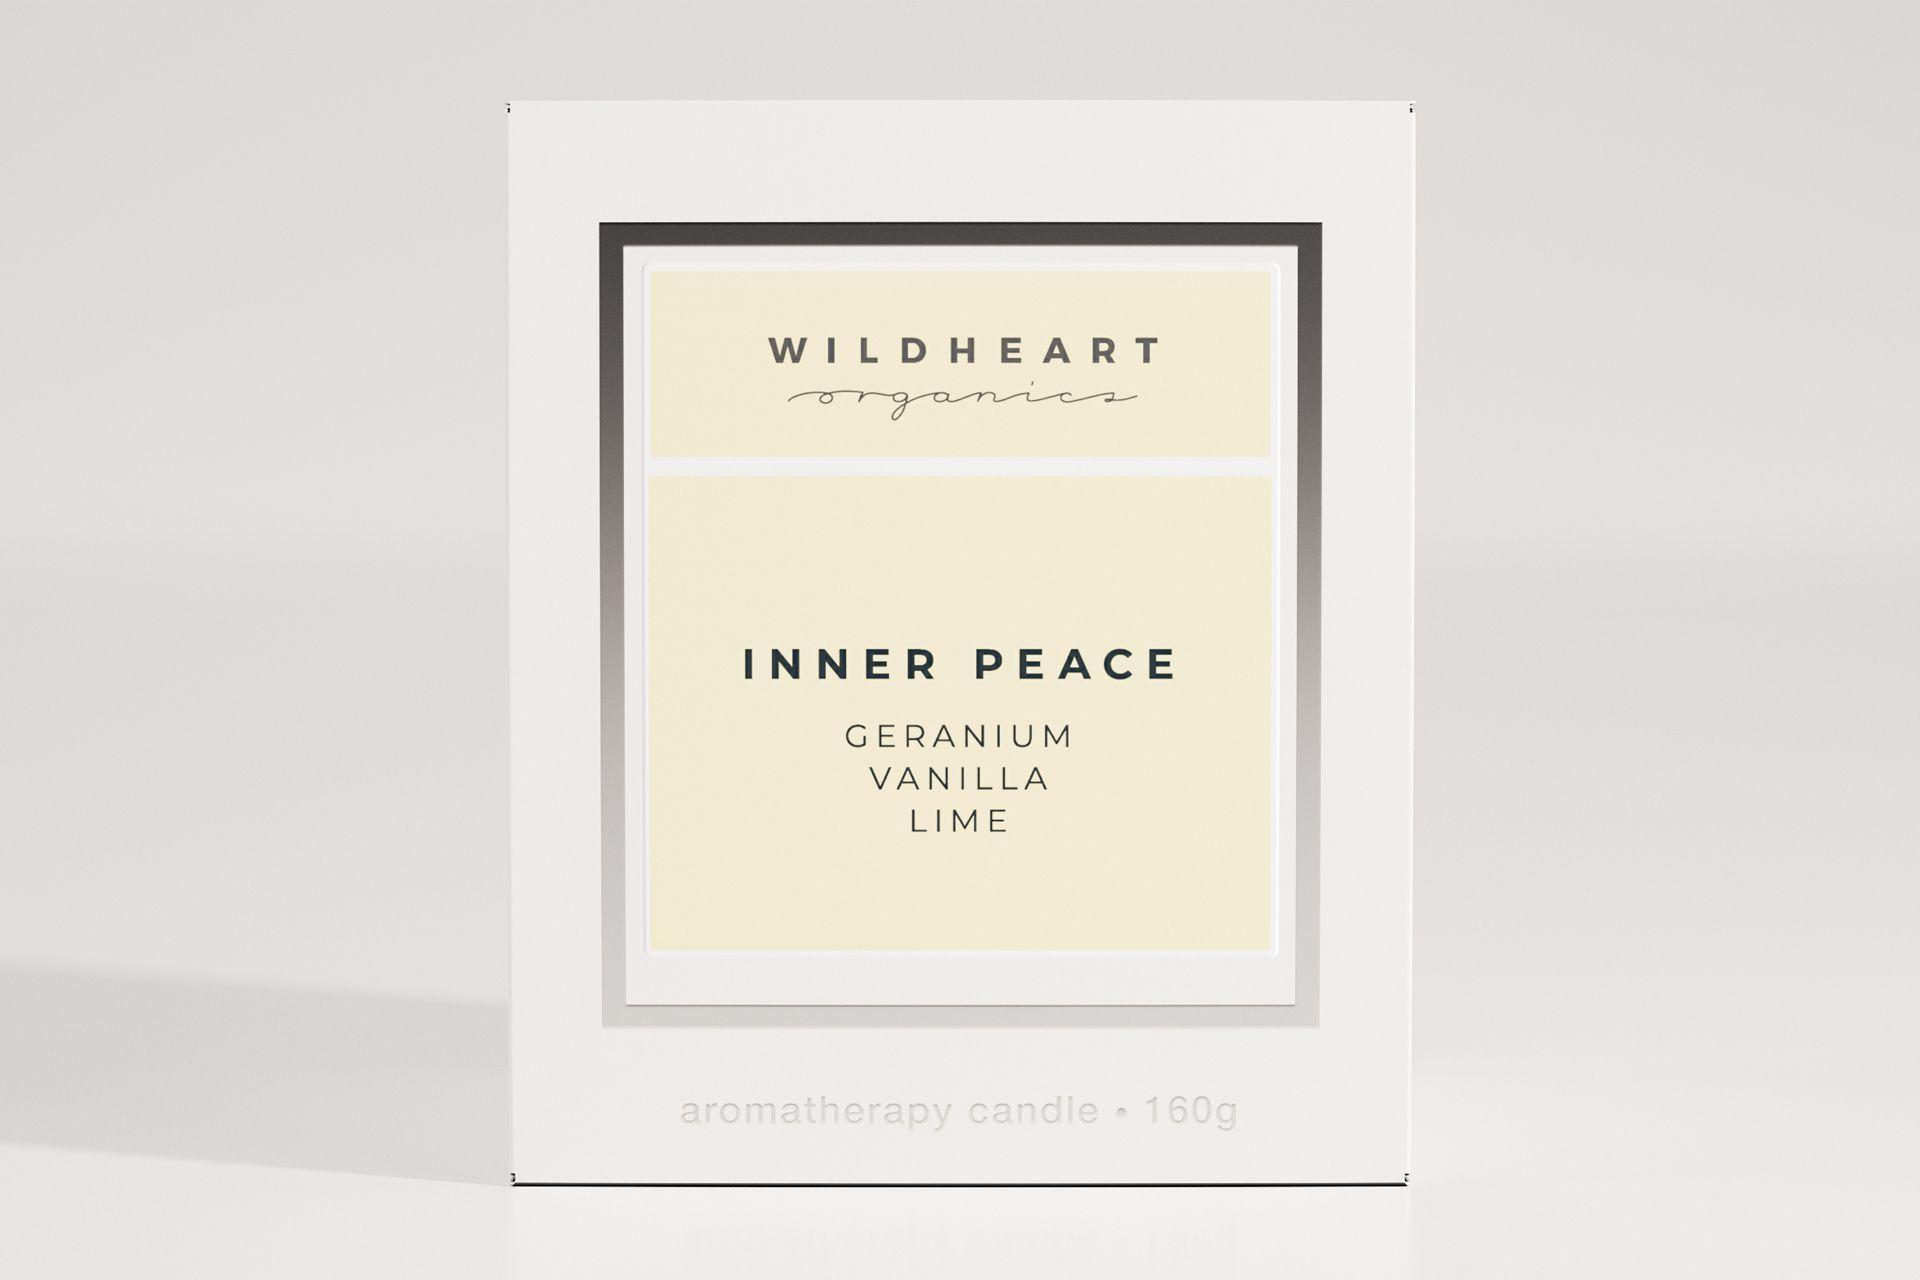 Wildheart Branding Inner Peace Candle